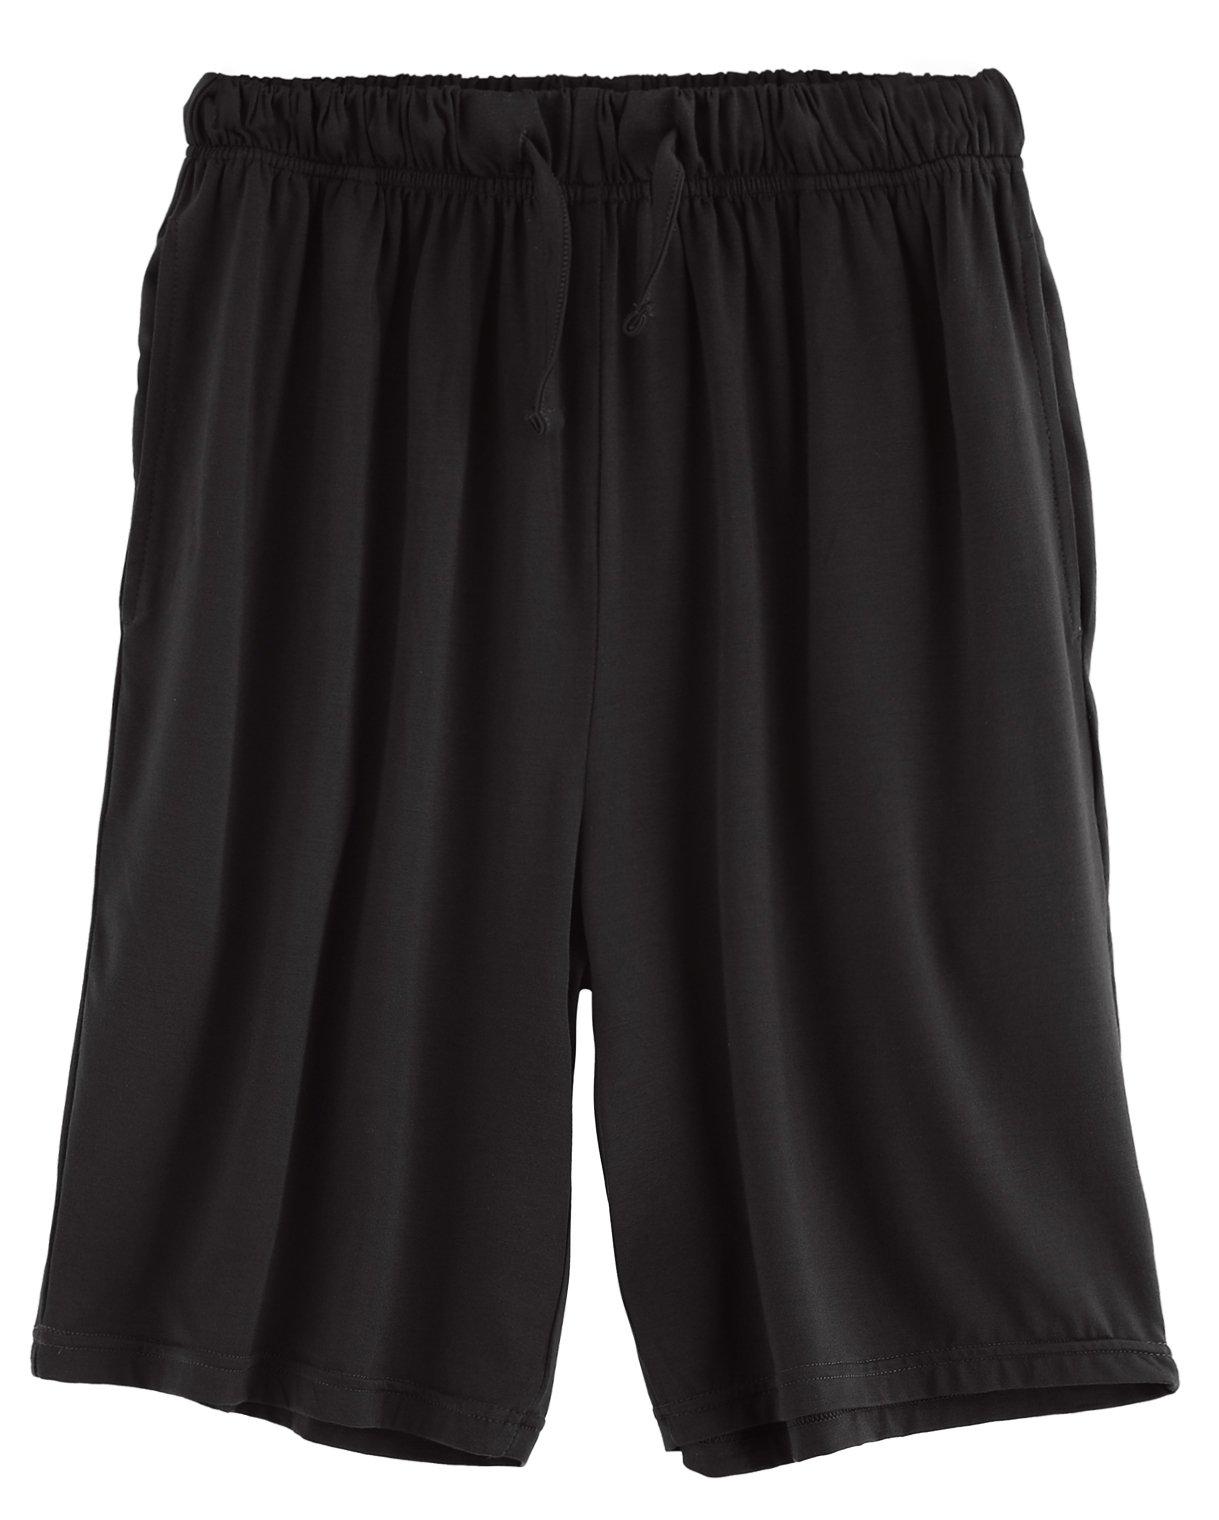 Latuza Men's Sleep Shorts Loose Lounge Shorts XXL Black